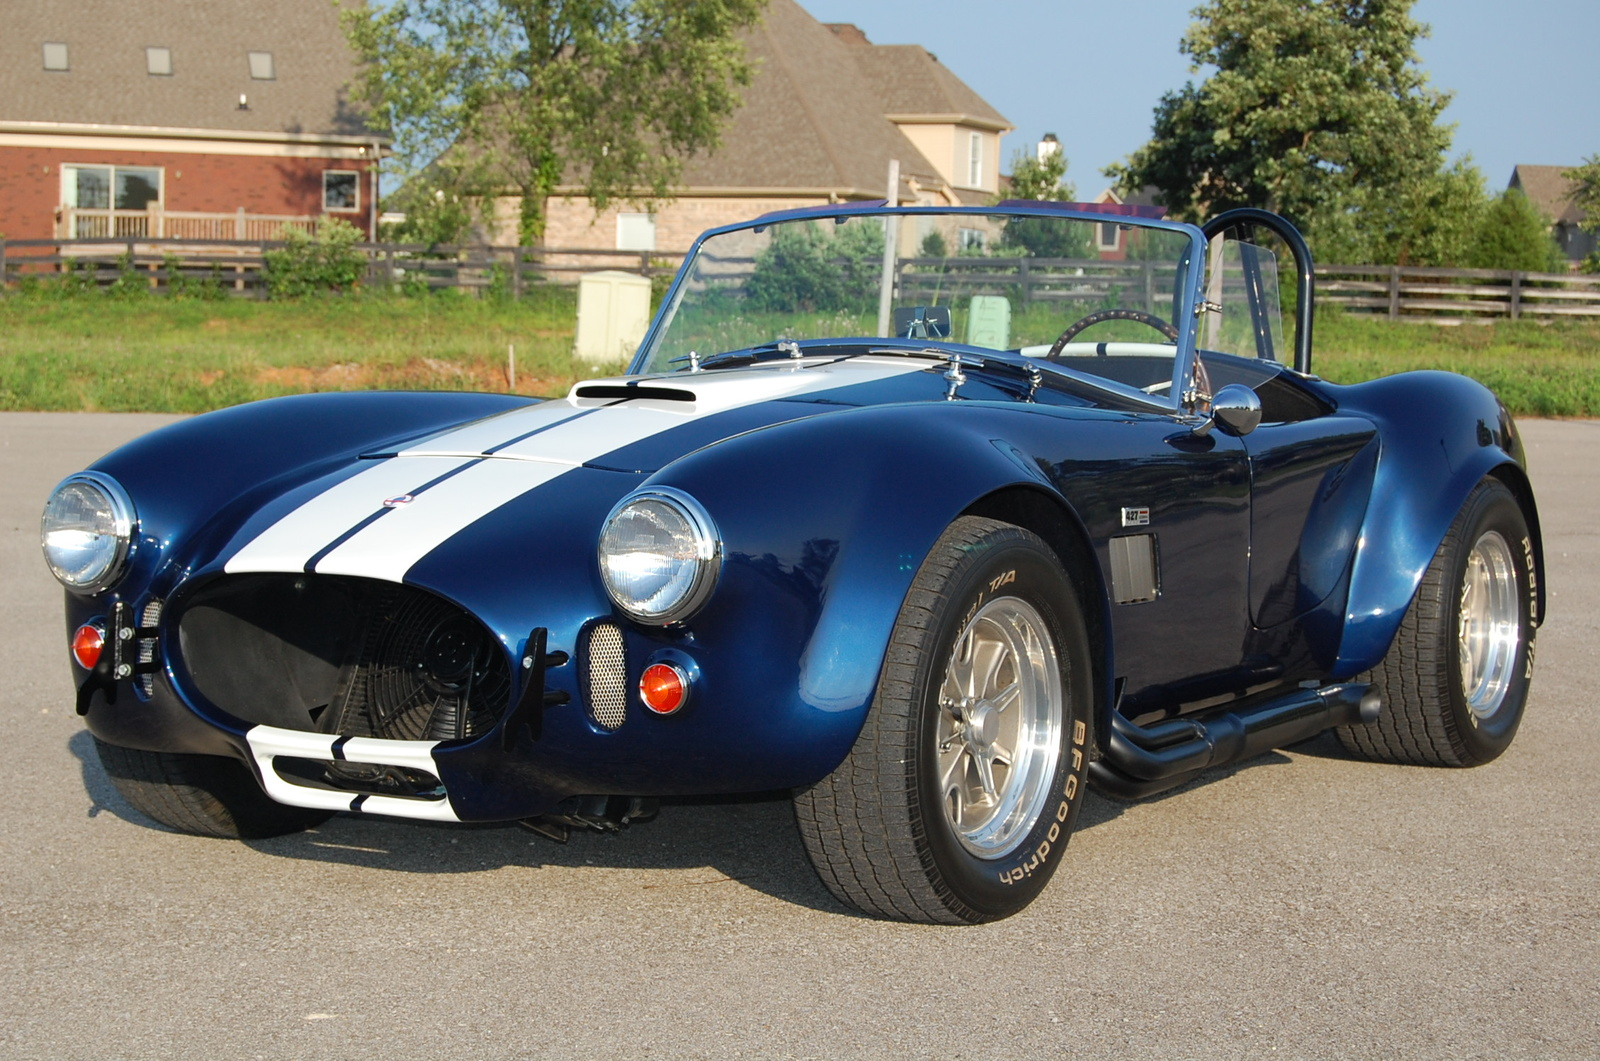 Shelby Cobra hot cars, enough said.